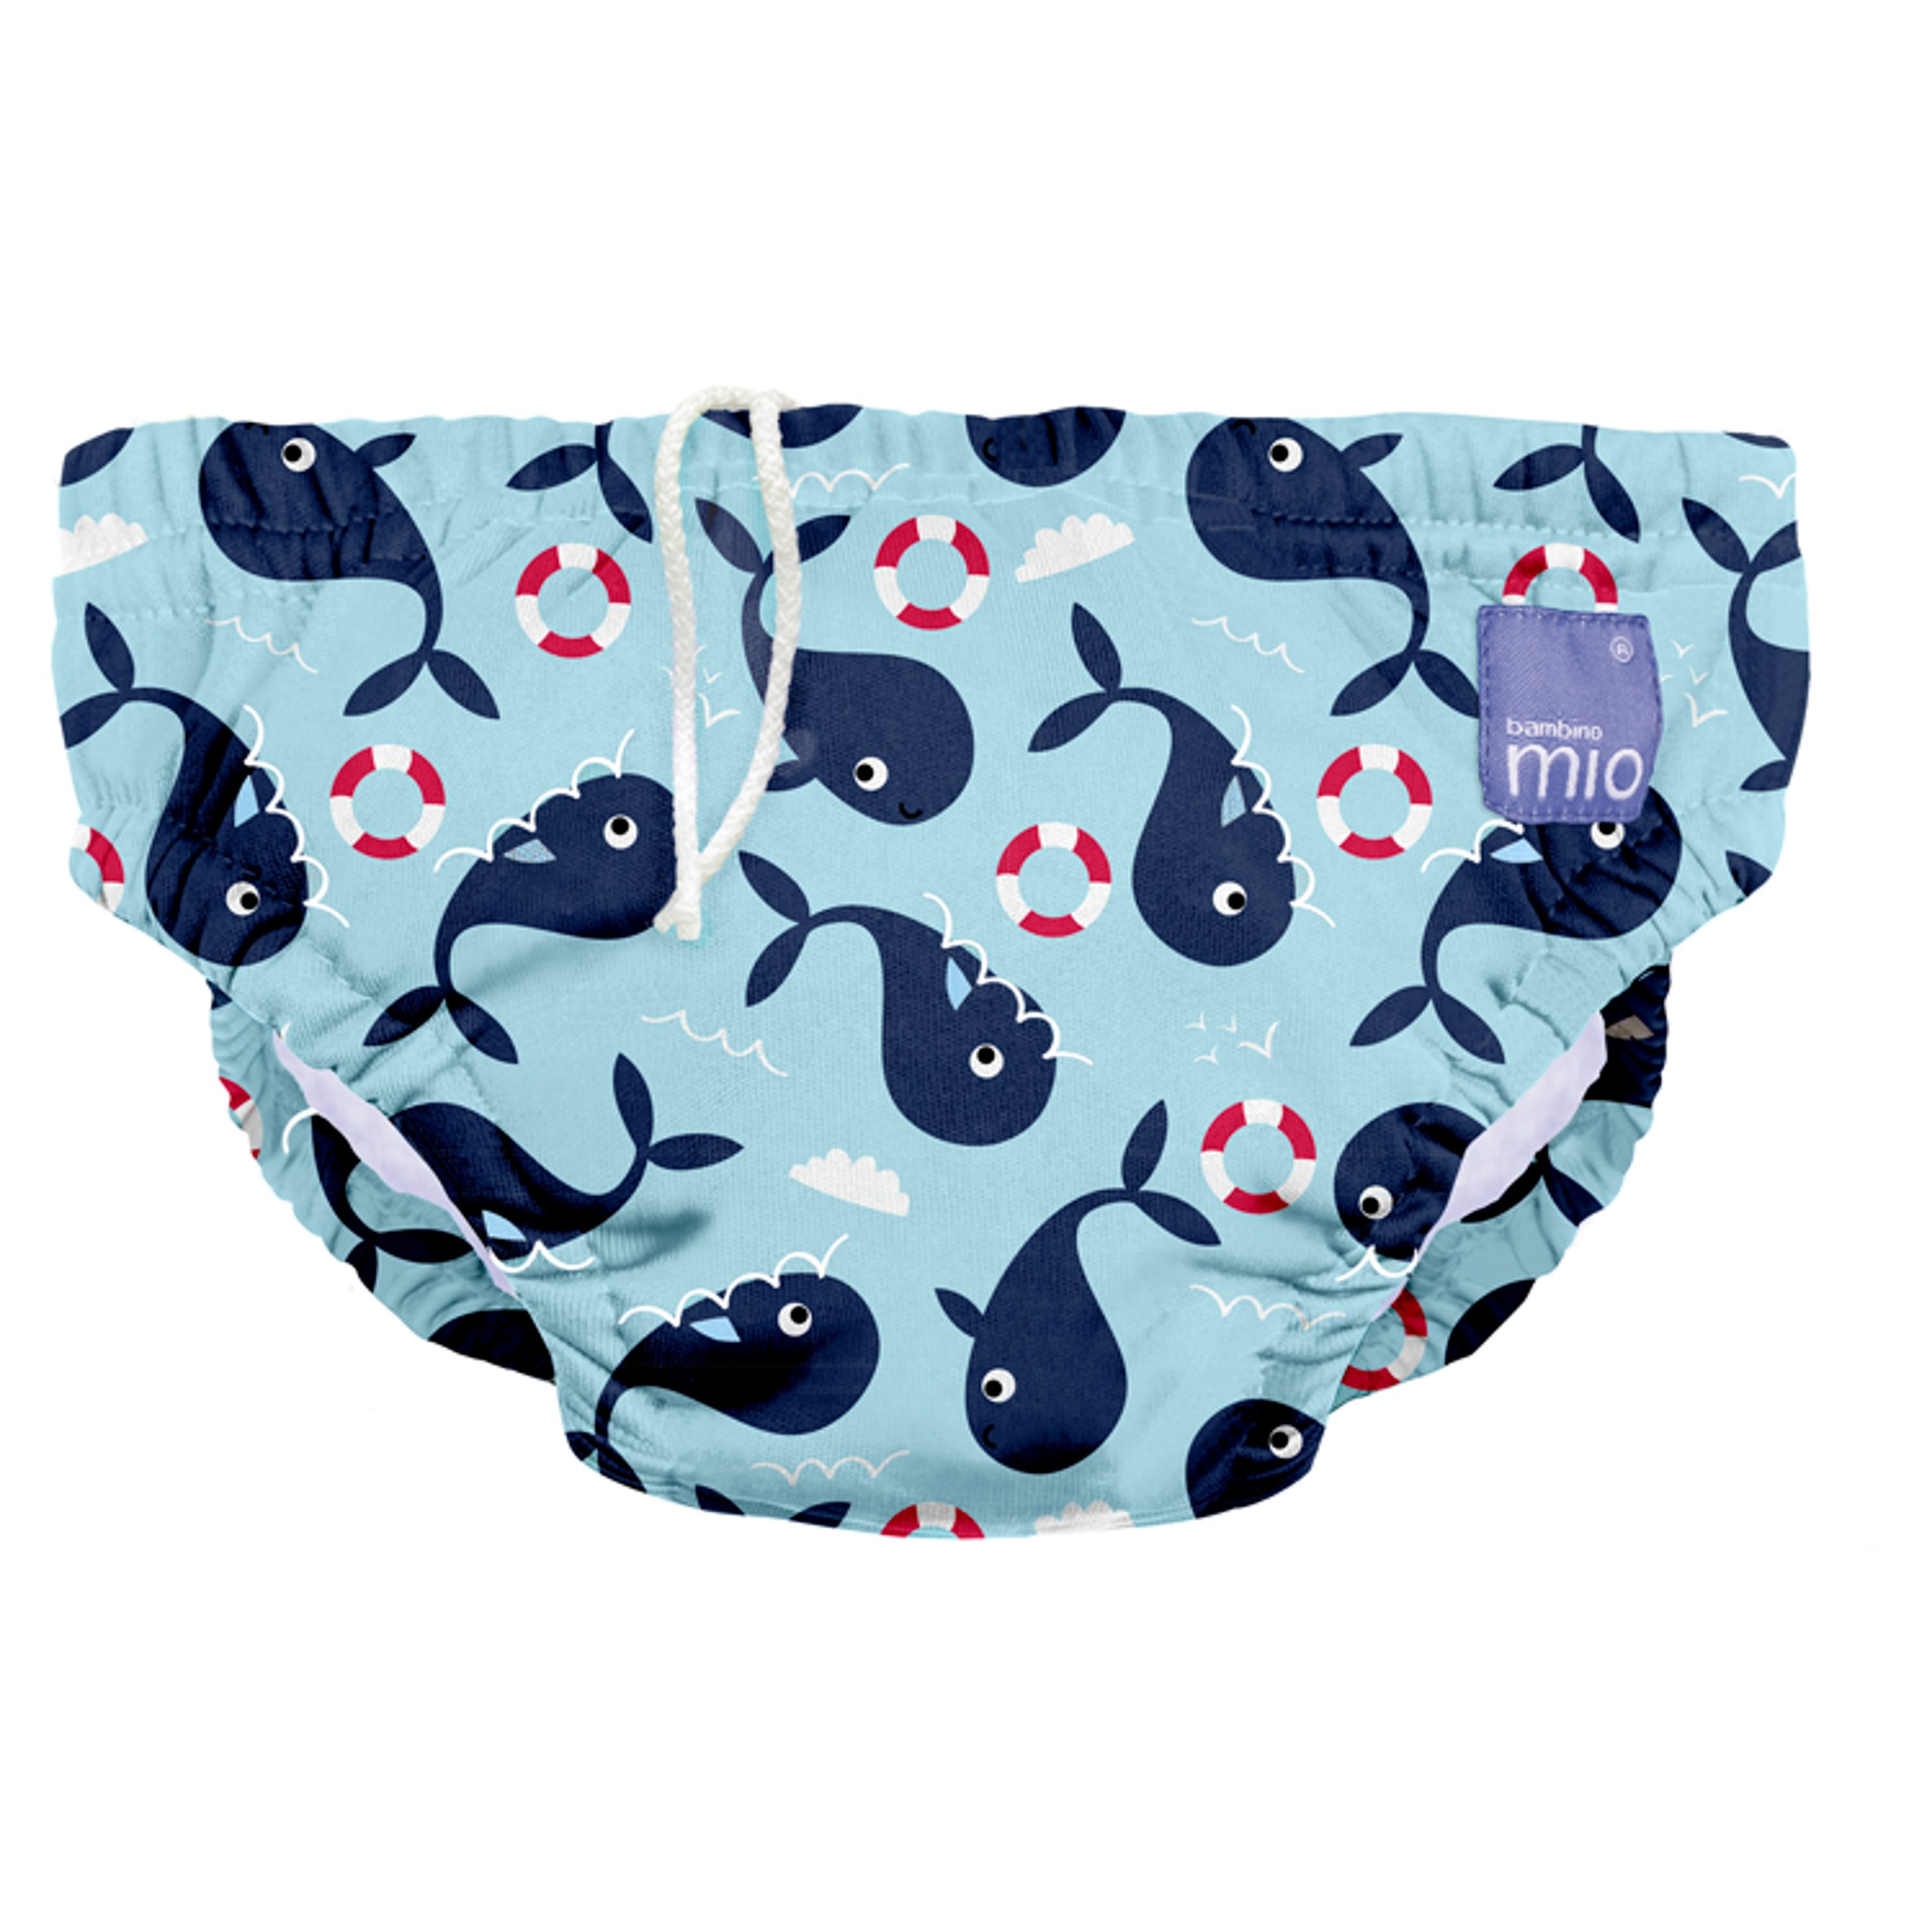 Bambino Mio Reusable Swim Nappy 2+Years